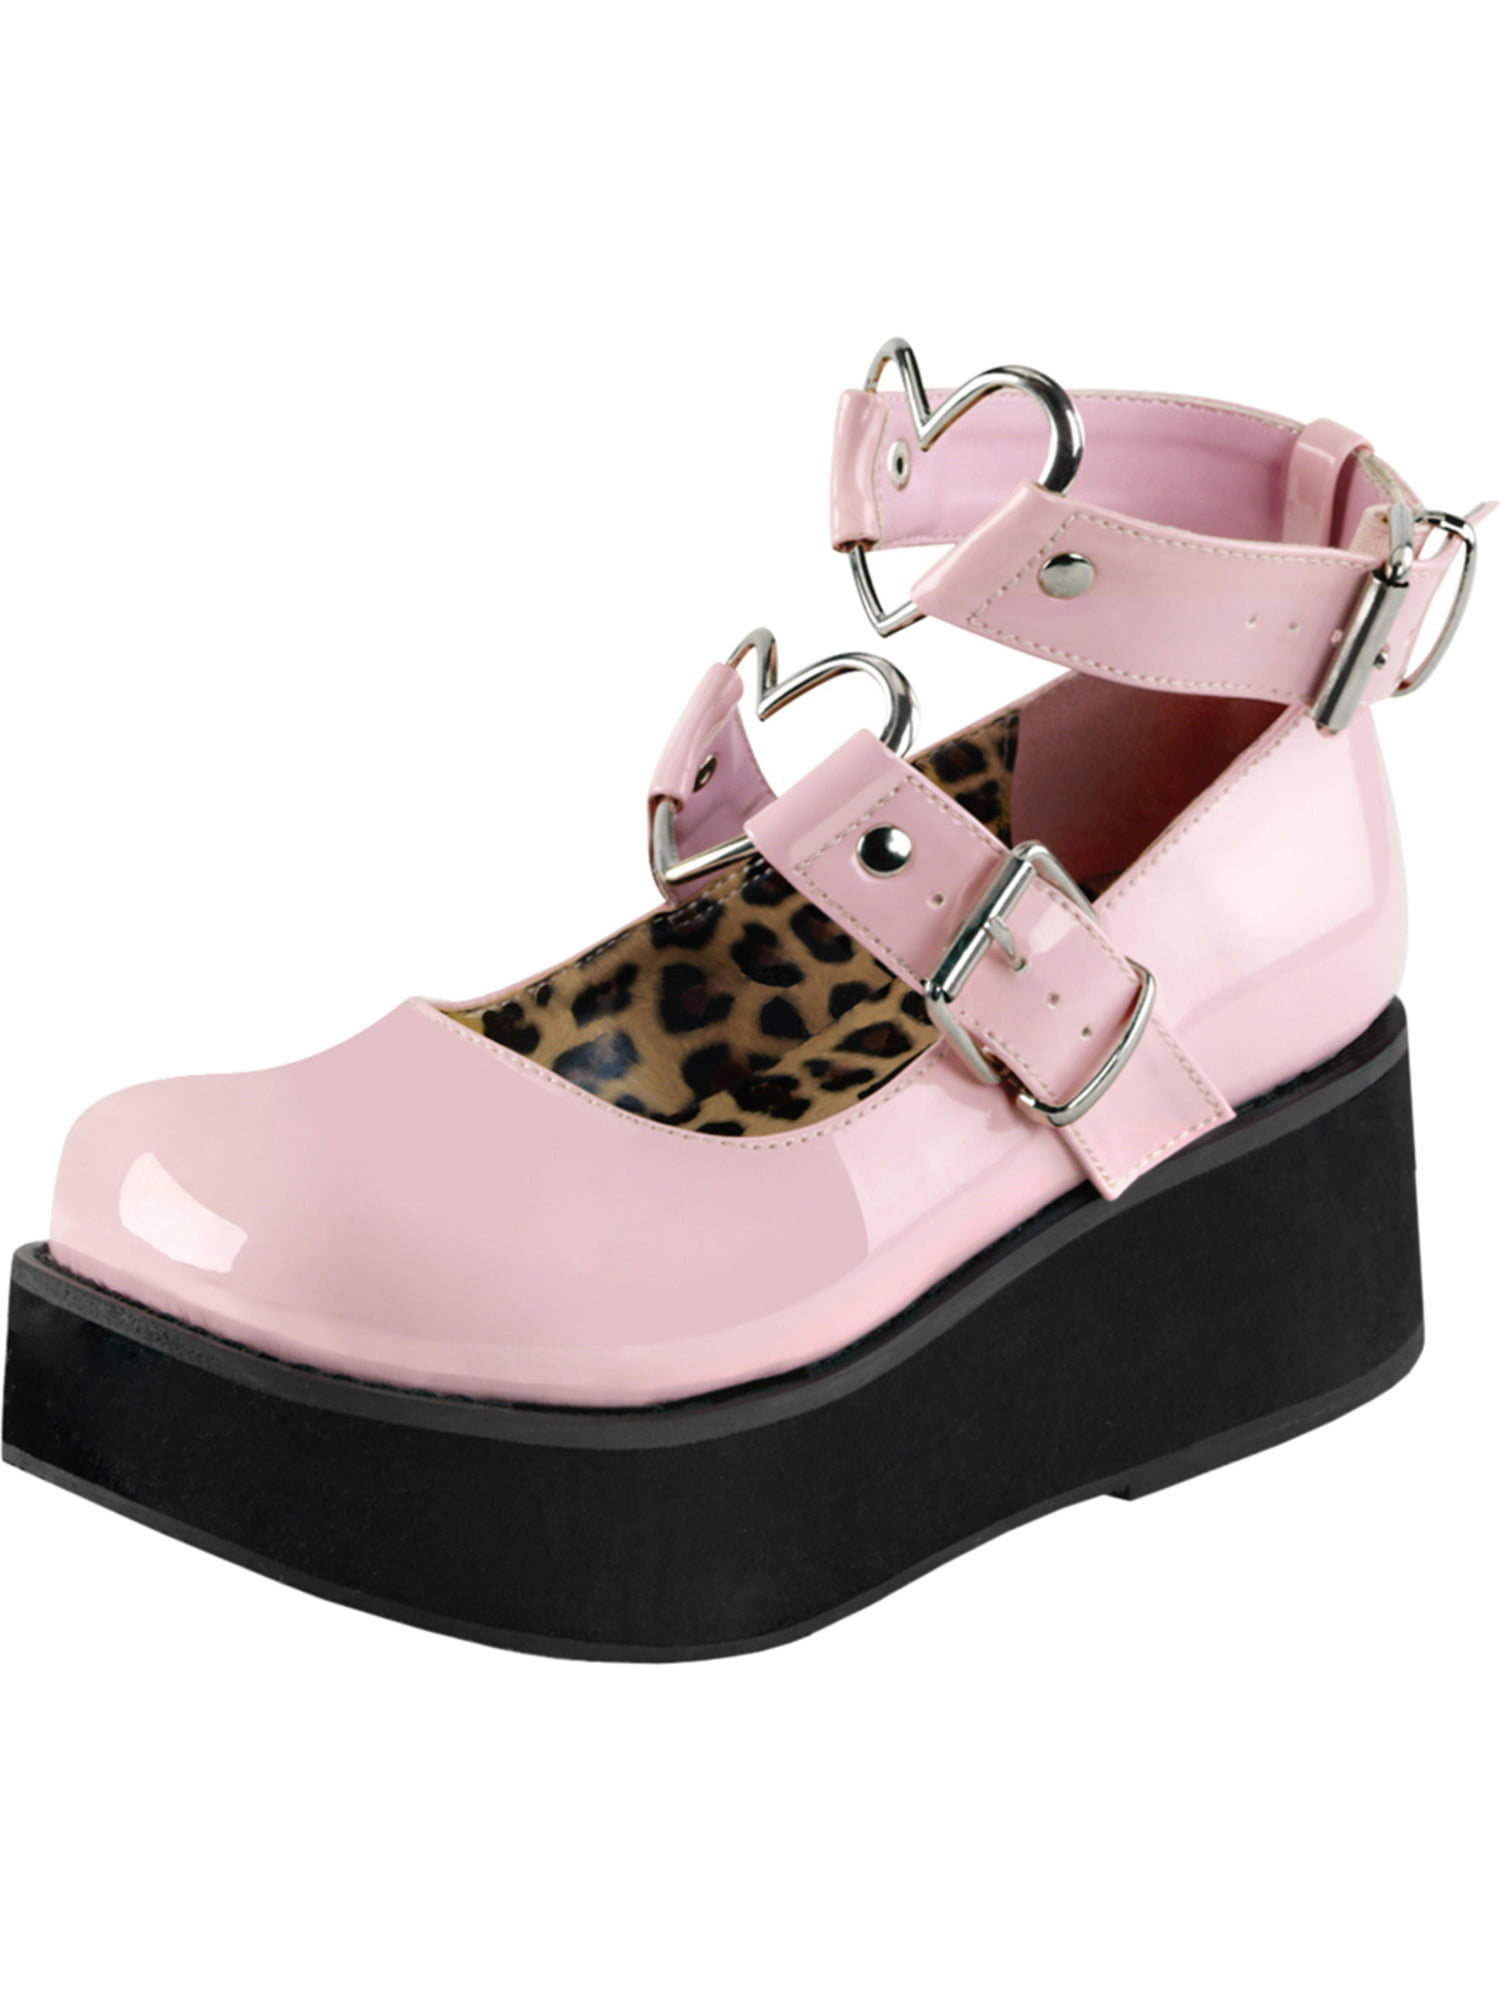 Womens Platform Shoes Mary Janes Baby Pink Shoes Platform Hearts Studs 2 1/4 Inch Platform 6ba37d